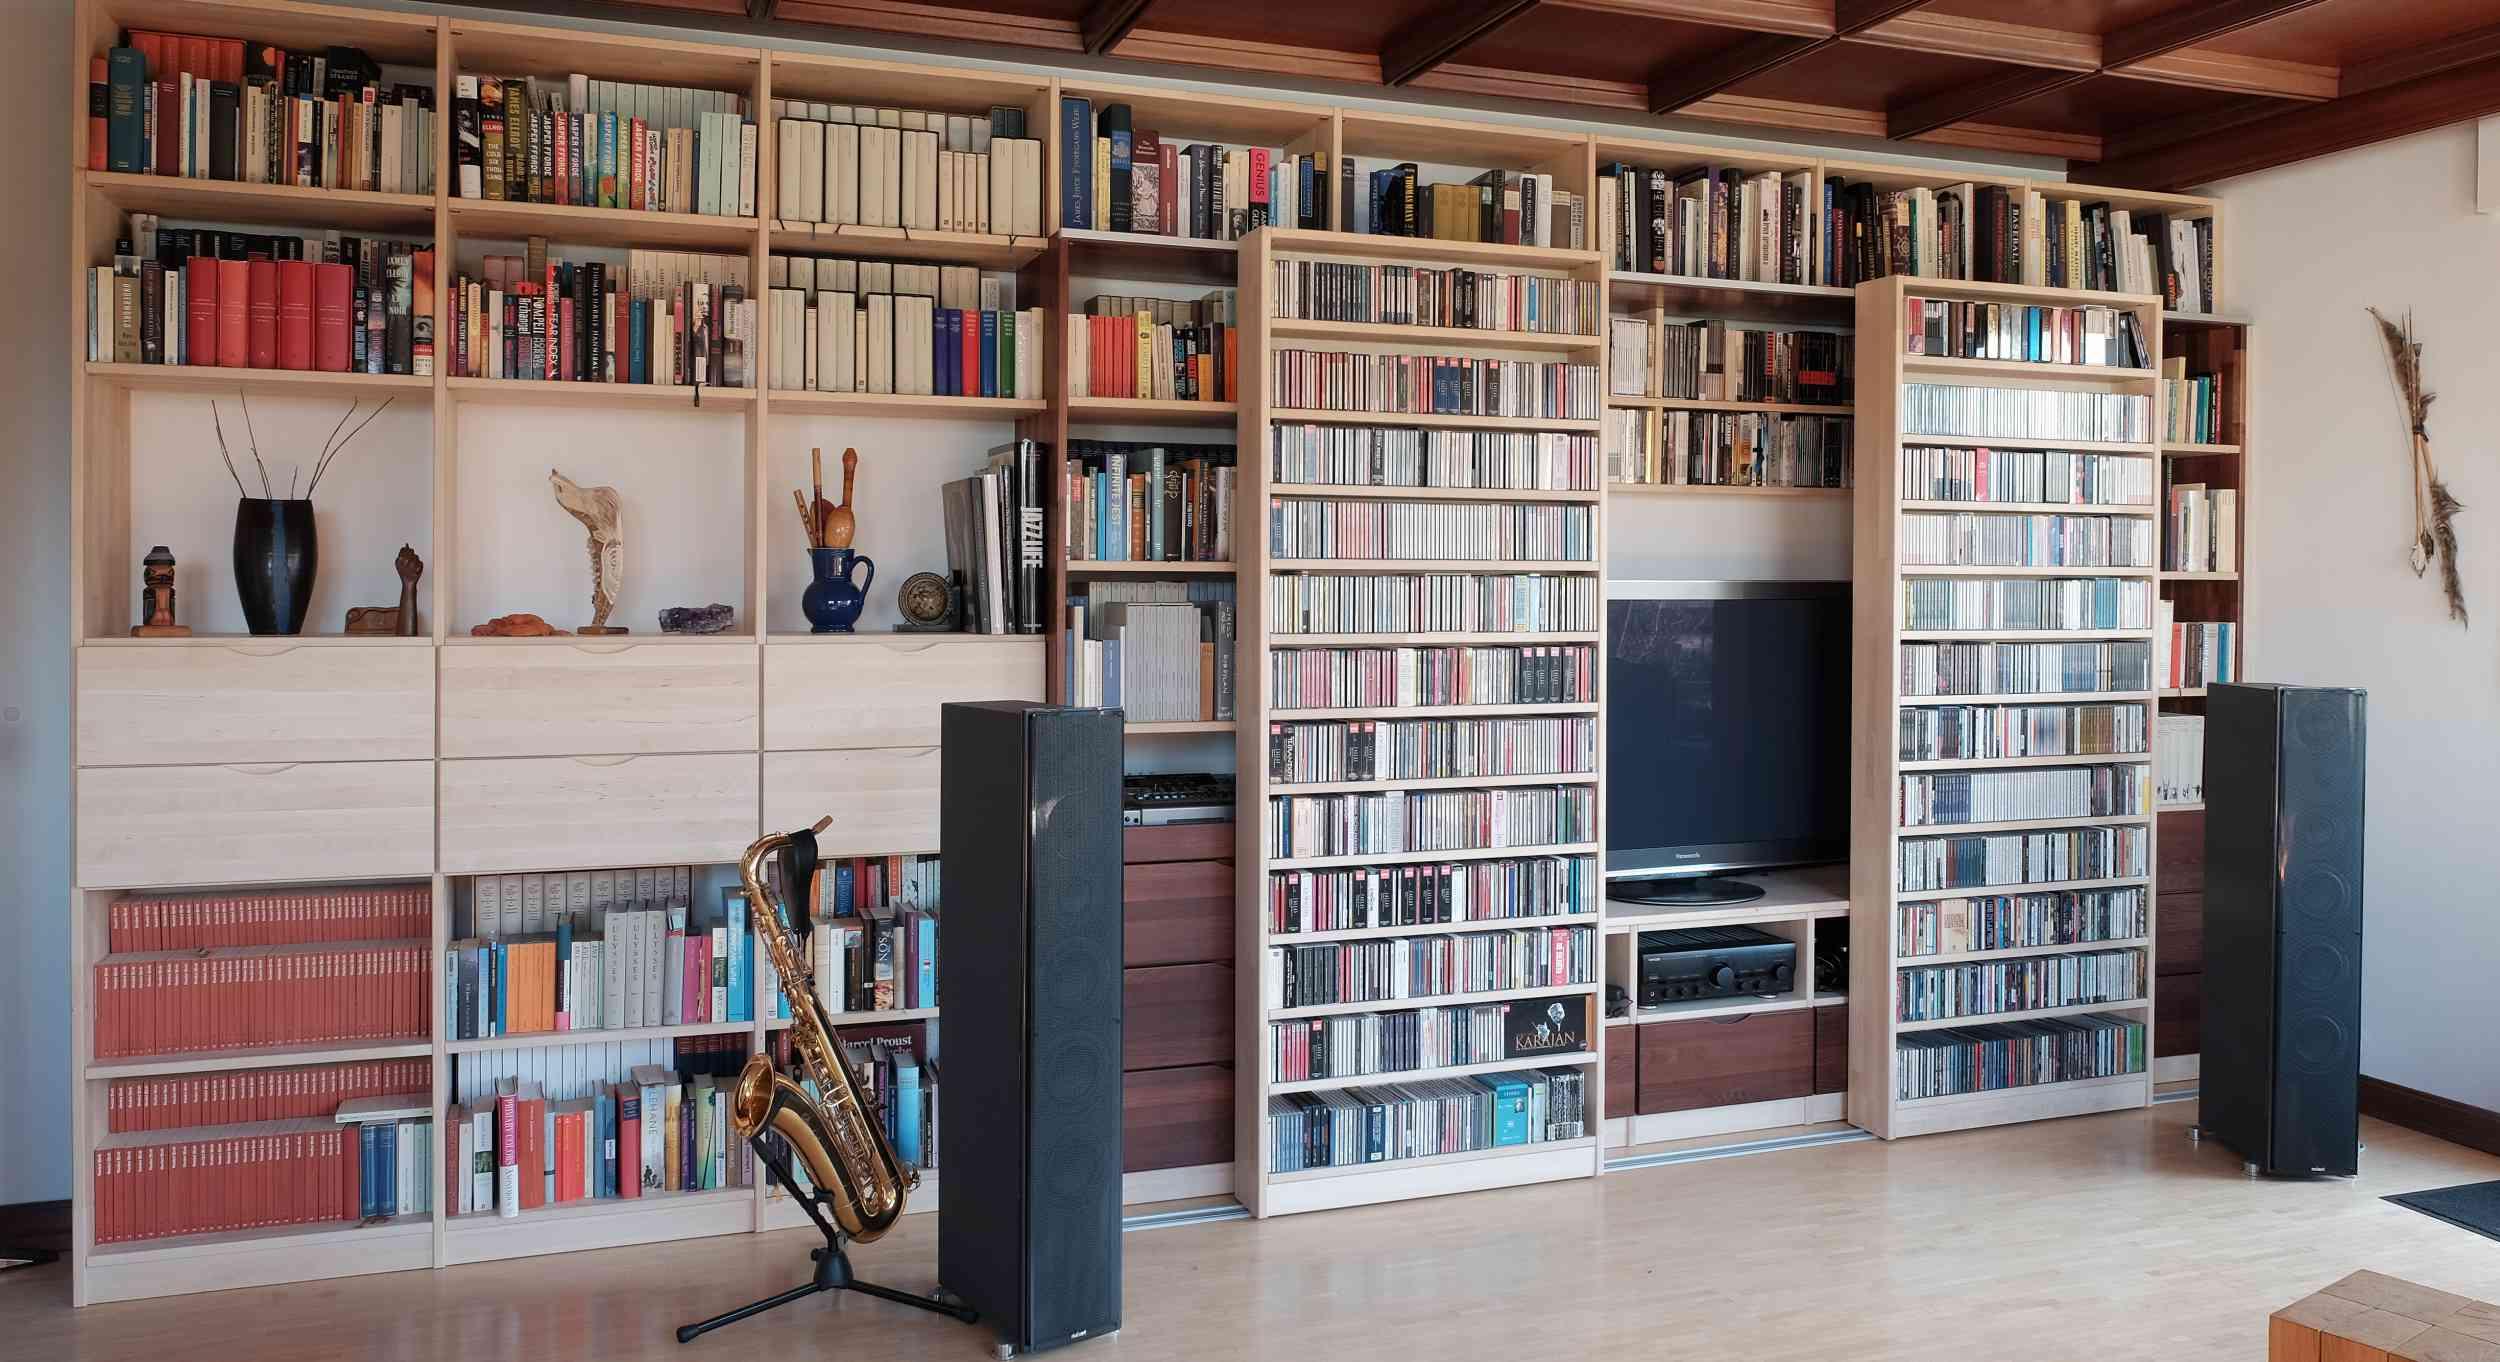 Full Size of Regal Konfigurator Trend Massivholz Mbel Online Konfigurieren Kinderzimmer Weiß Hochglanz Naturholz Werkstatt Paschen Regale Holzregal Badezimmer Mit Regal Regal Konfigurator